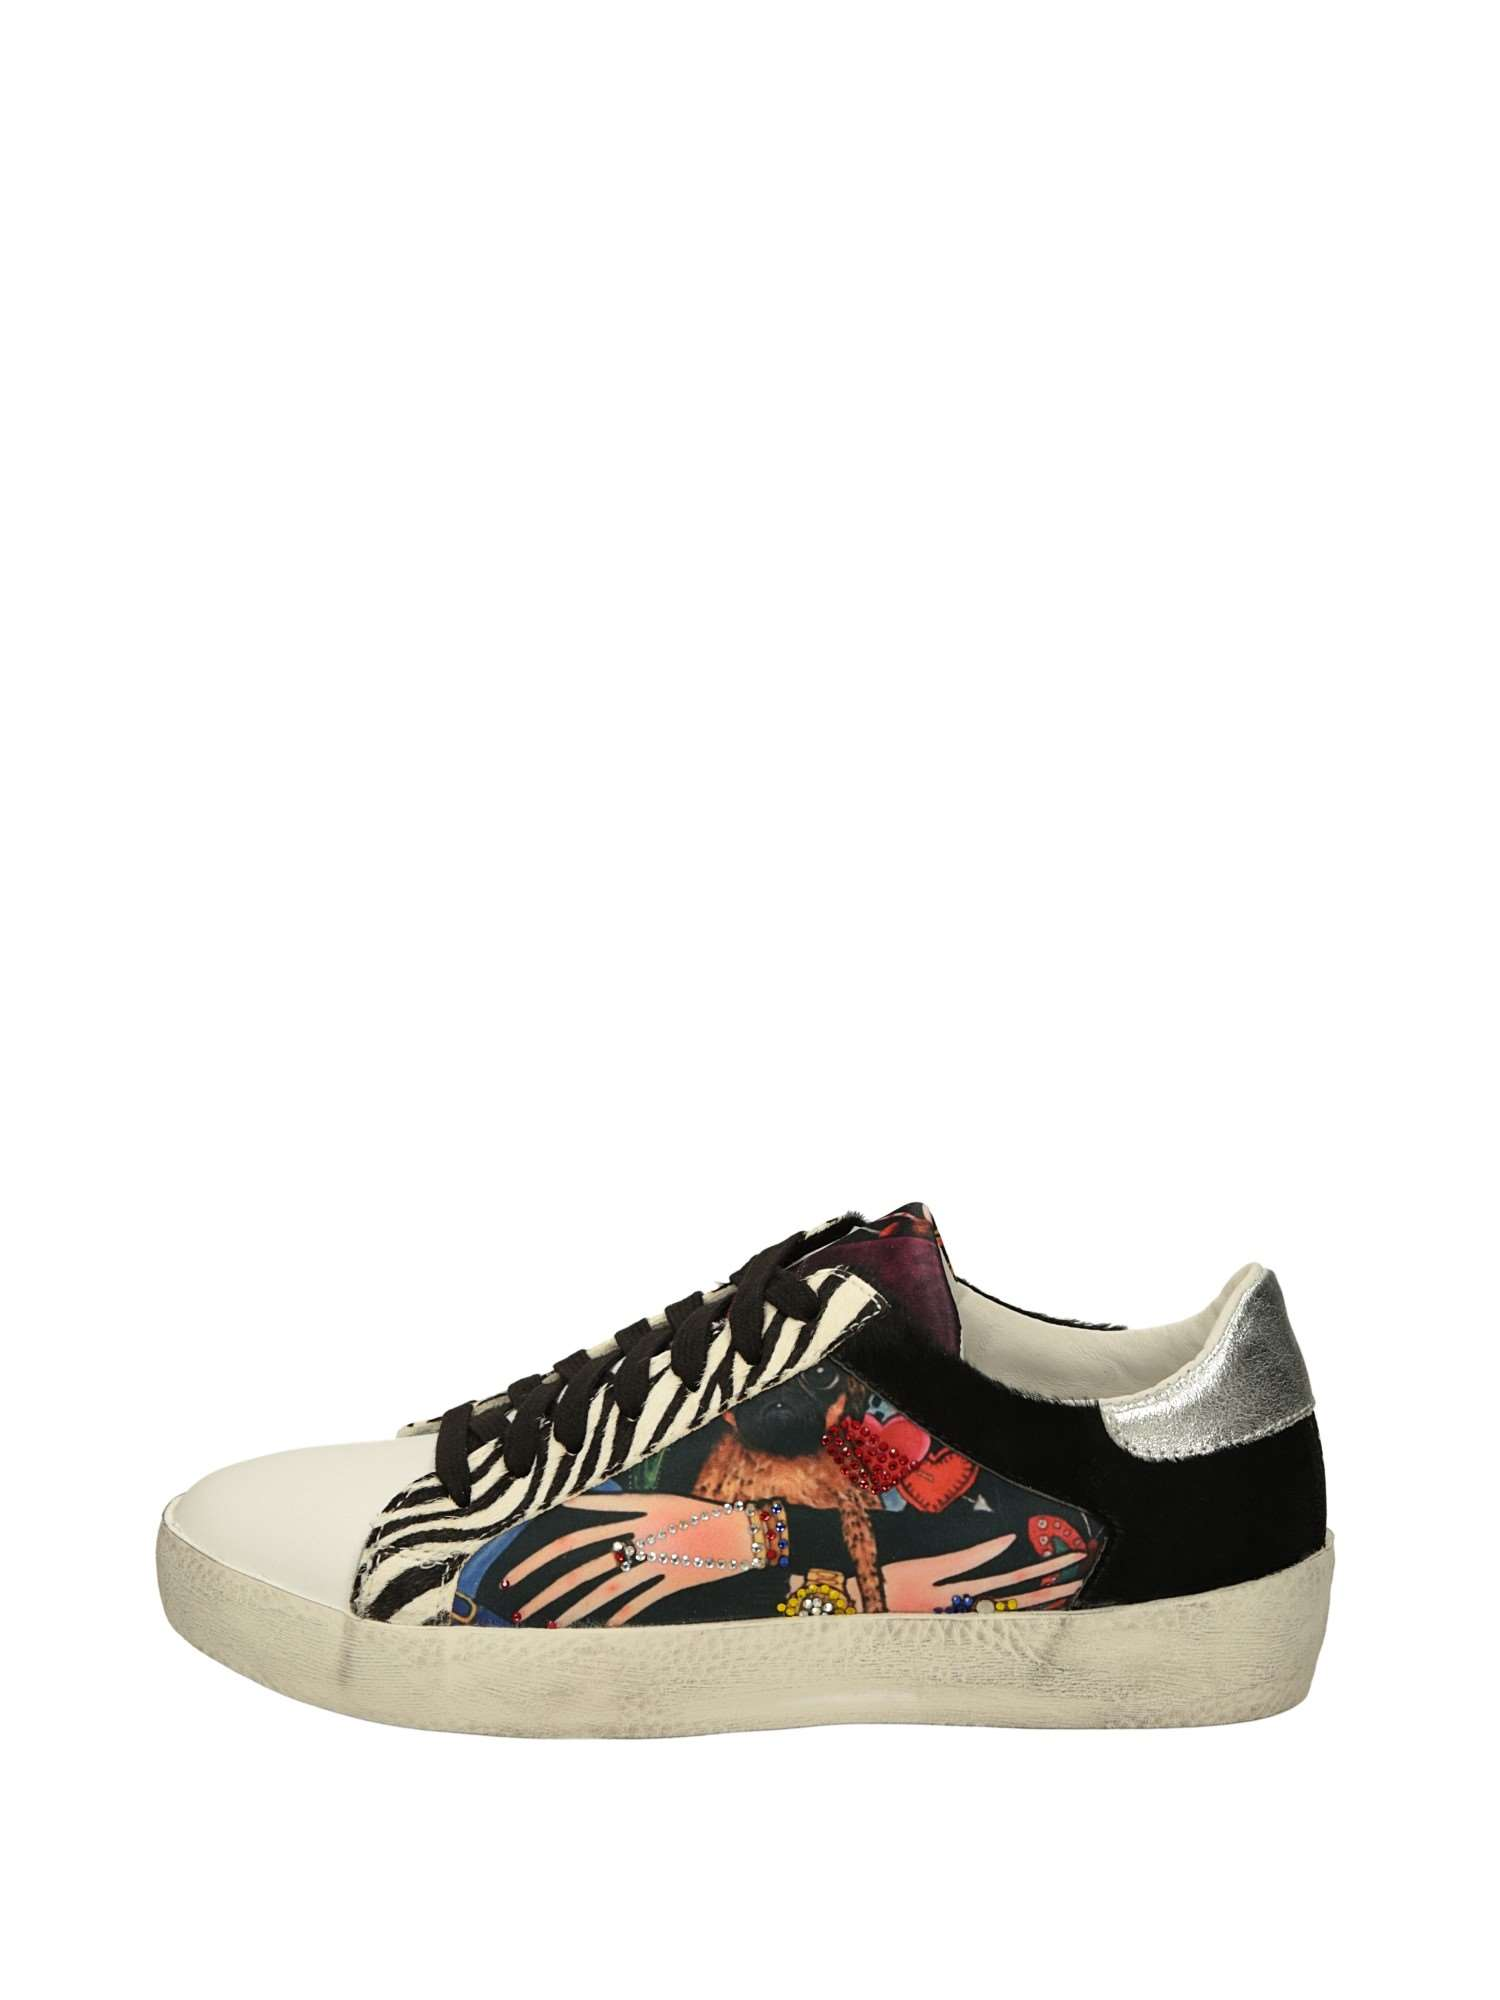 design di qualità 8fef5 a4a82 Meline Sneakers Basse Donna Bianco Nero   Lalilina